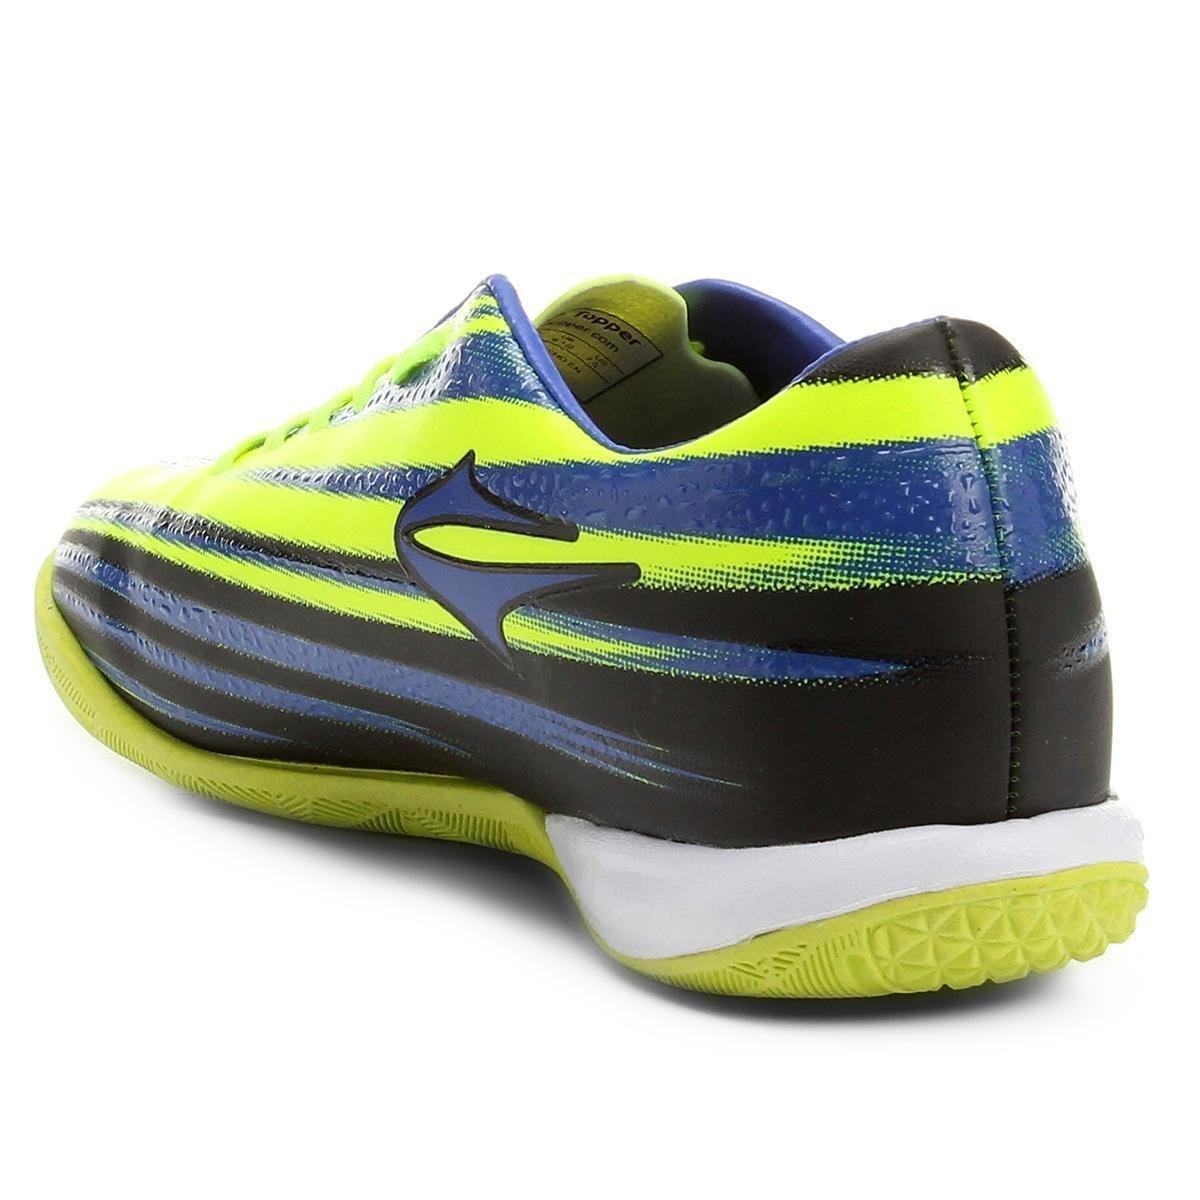 Chuteira Futsal Topper Vector 2 - Preto e Azul - Compre Agora  435970f0fa15c